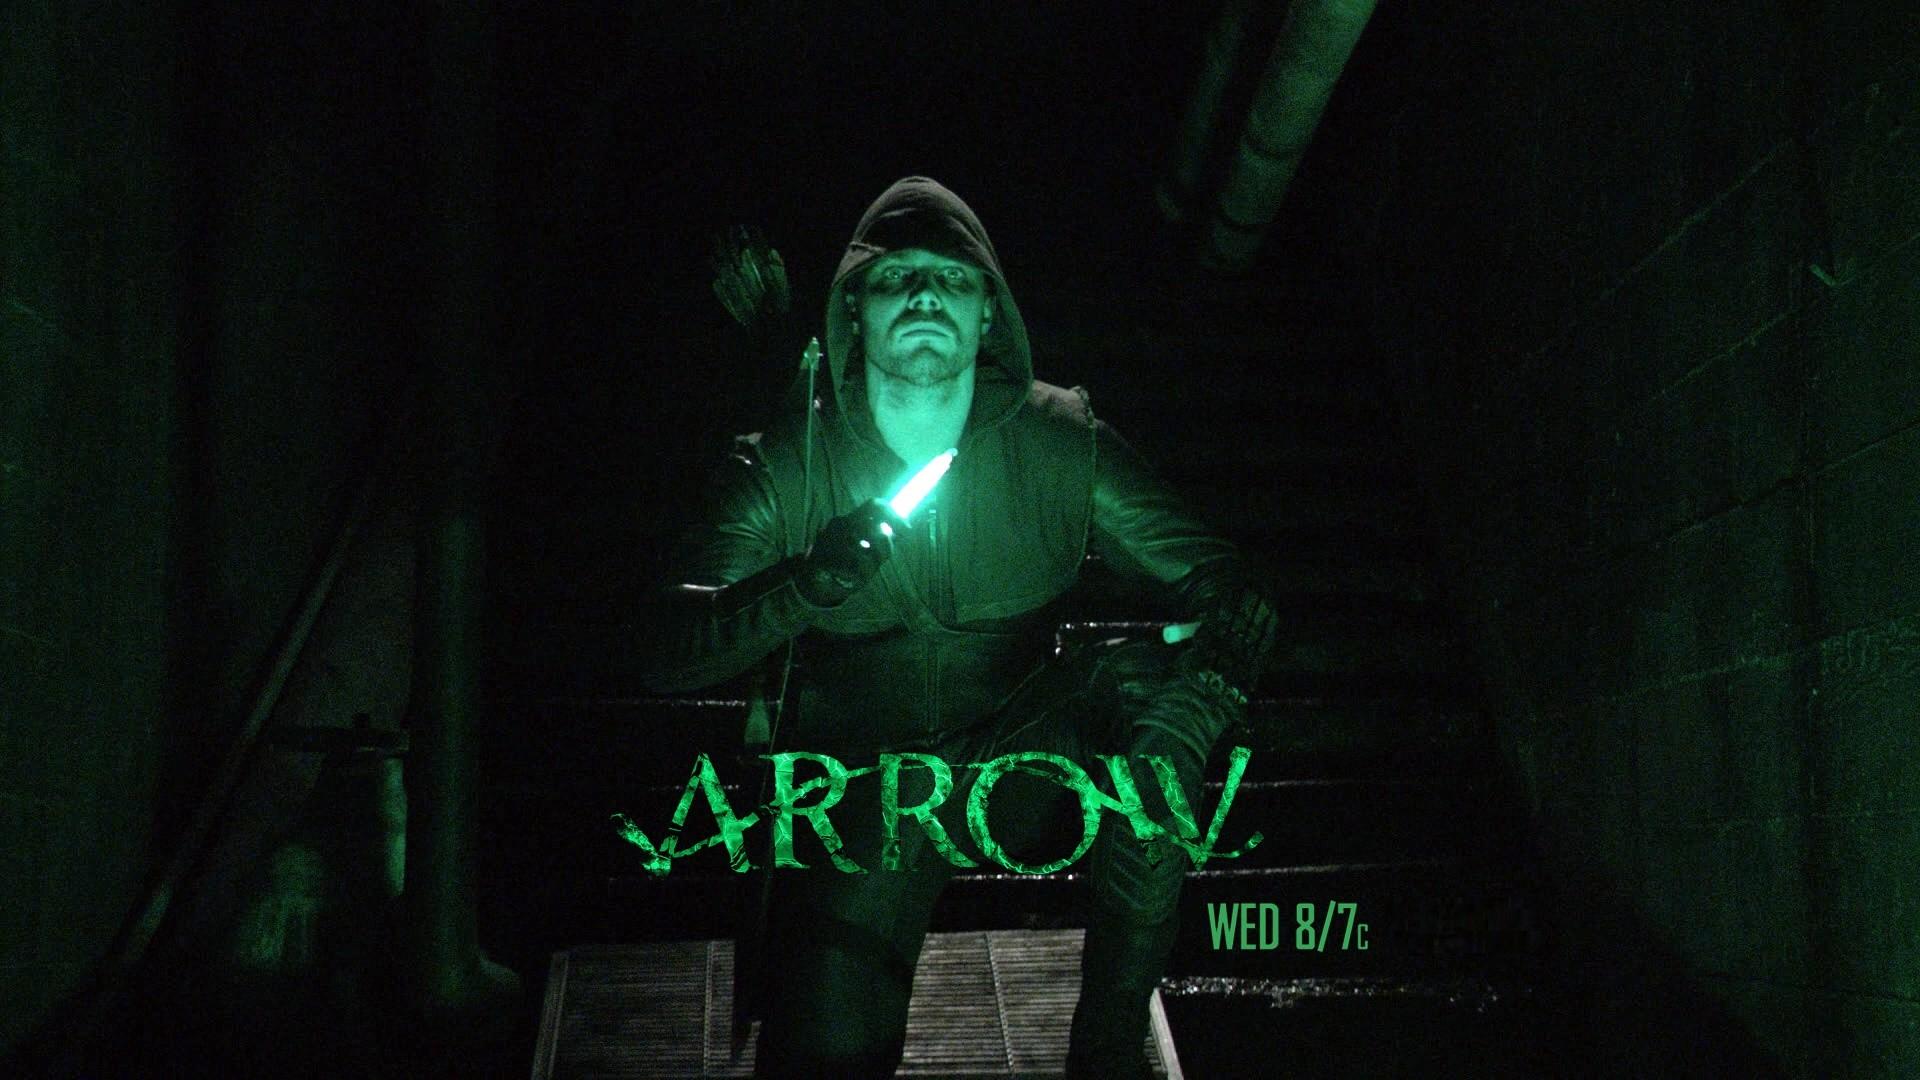 Green Arrow Wallpaper Best Background Wallpaper